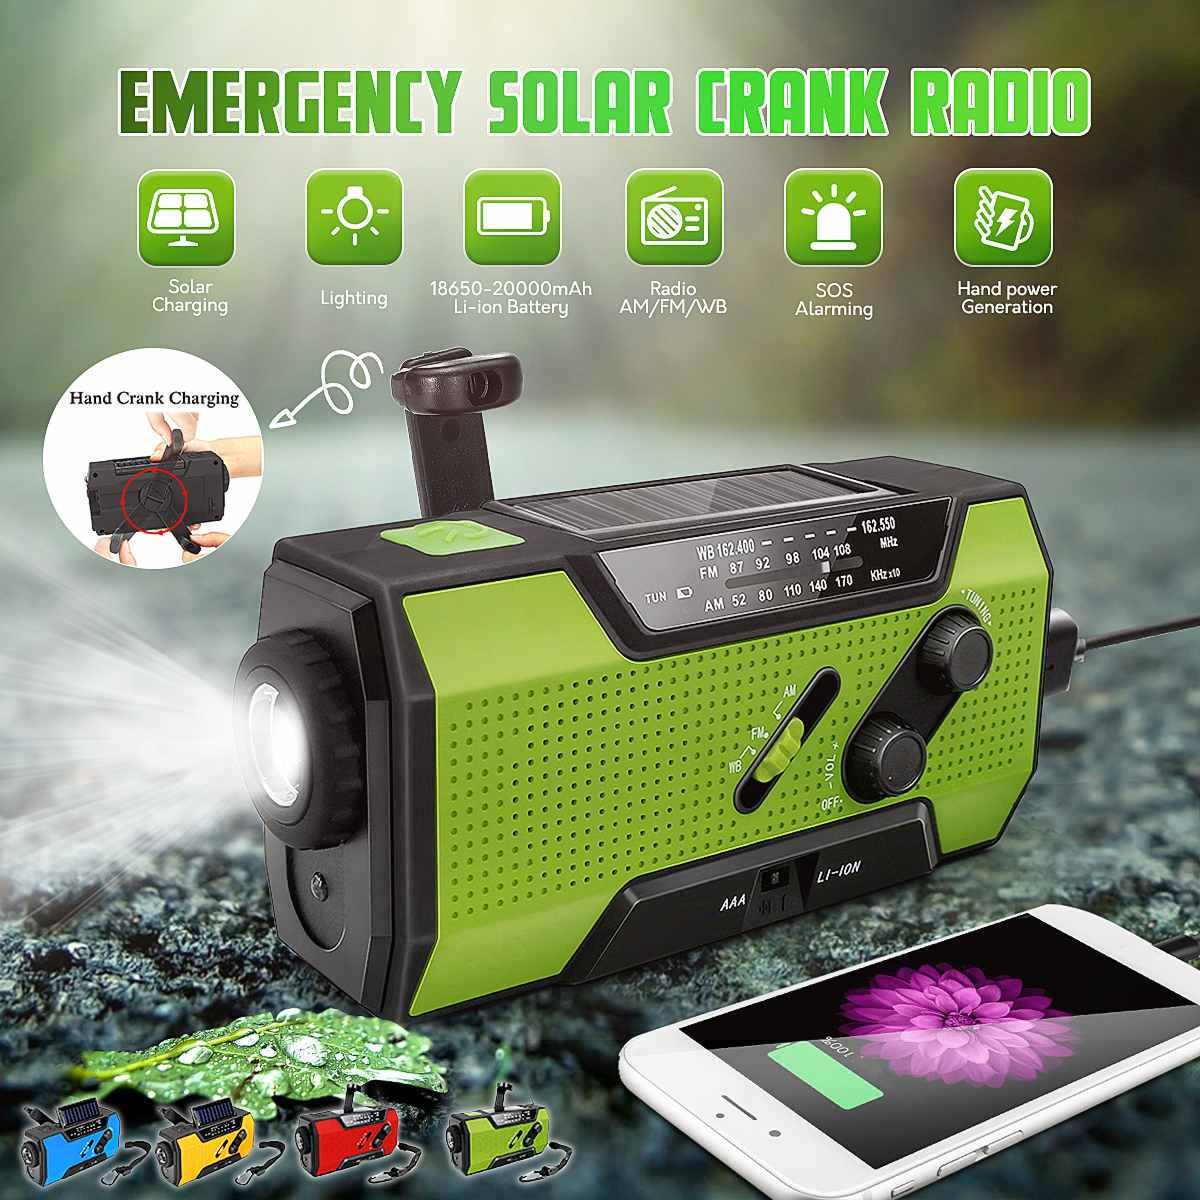 LEORY WB Solar Digital Crank Emergency AM/FM NOAA Weather Portable Radio  Flashlight Solar Panel Flashlight Rechargeable Power